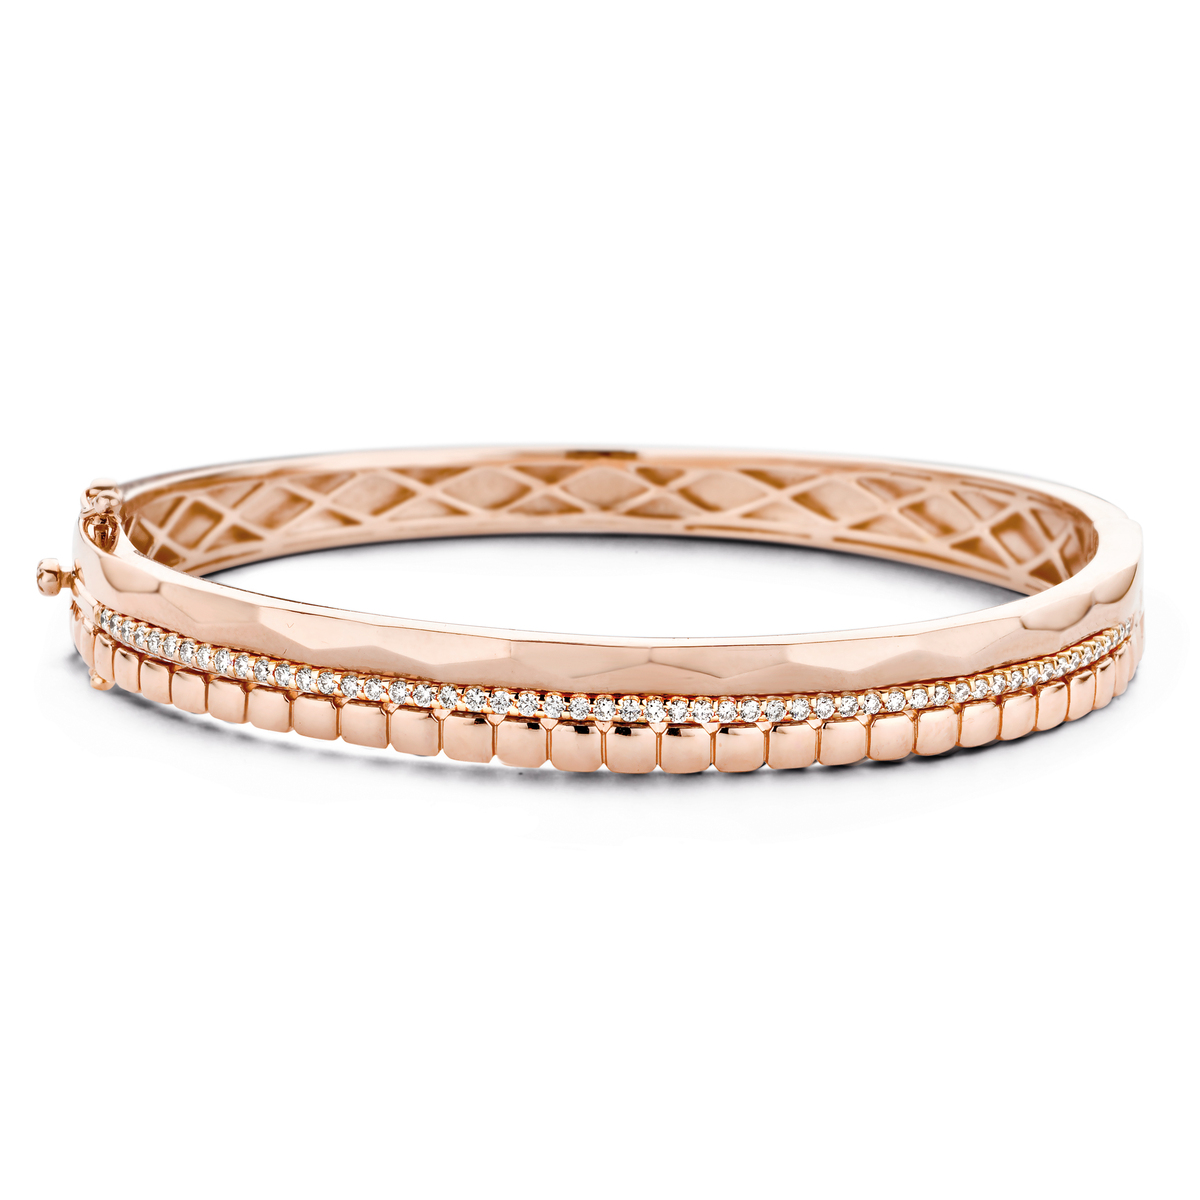 ischia bracelet in rose gold